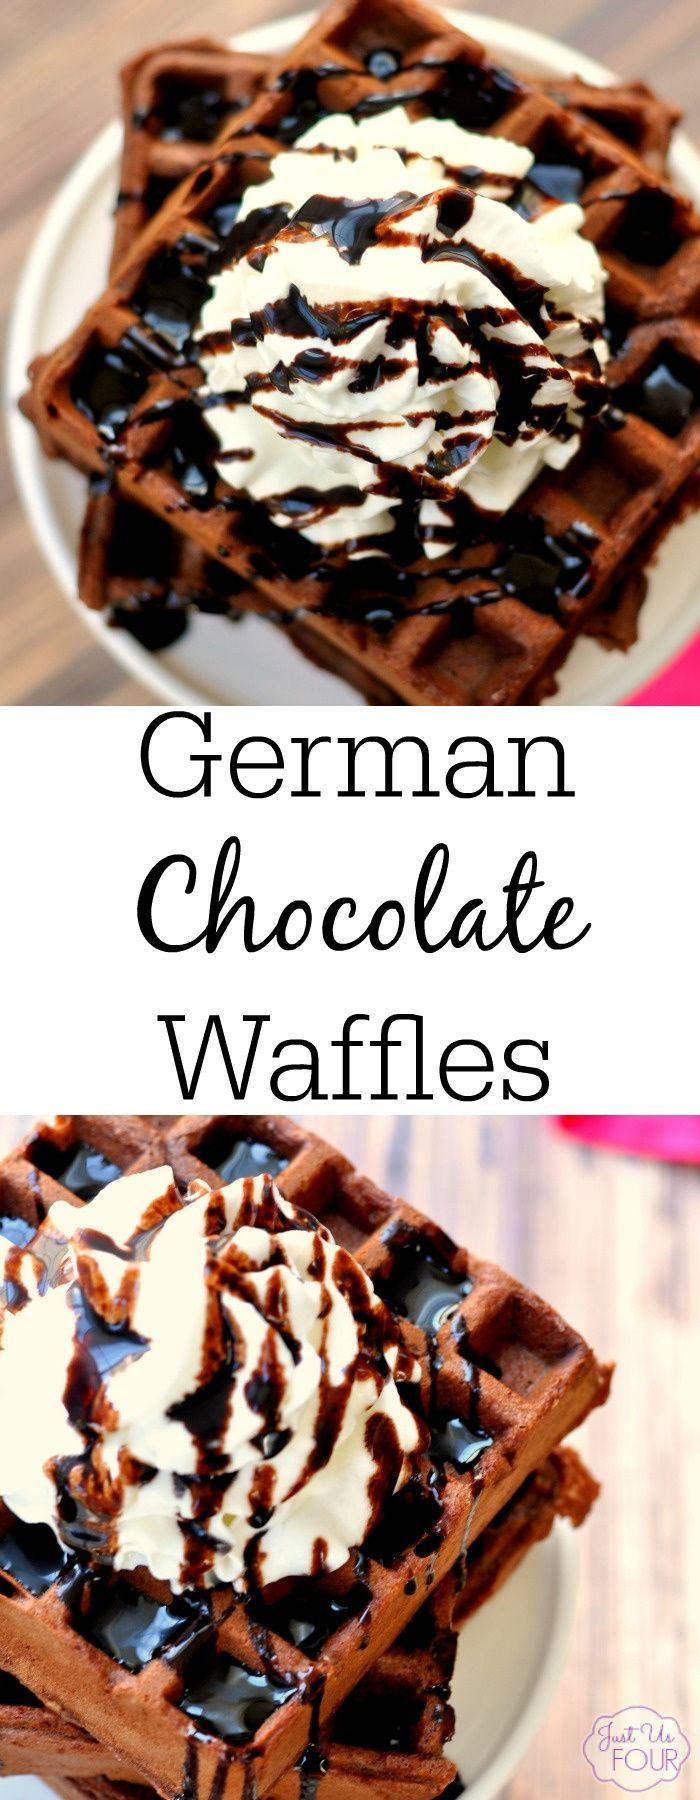 Top 25+ best Chocolate waffles ideas on Pinterest | Cake batter ...